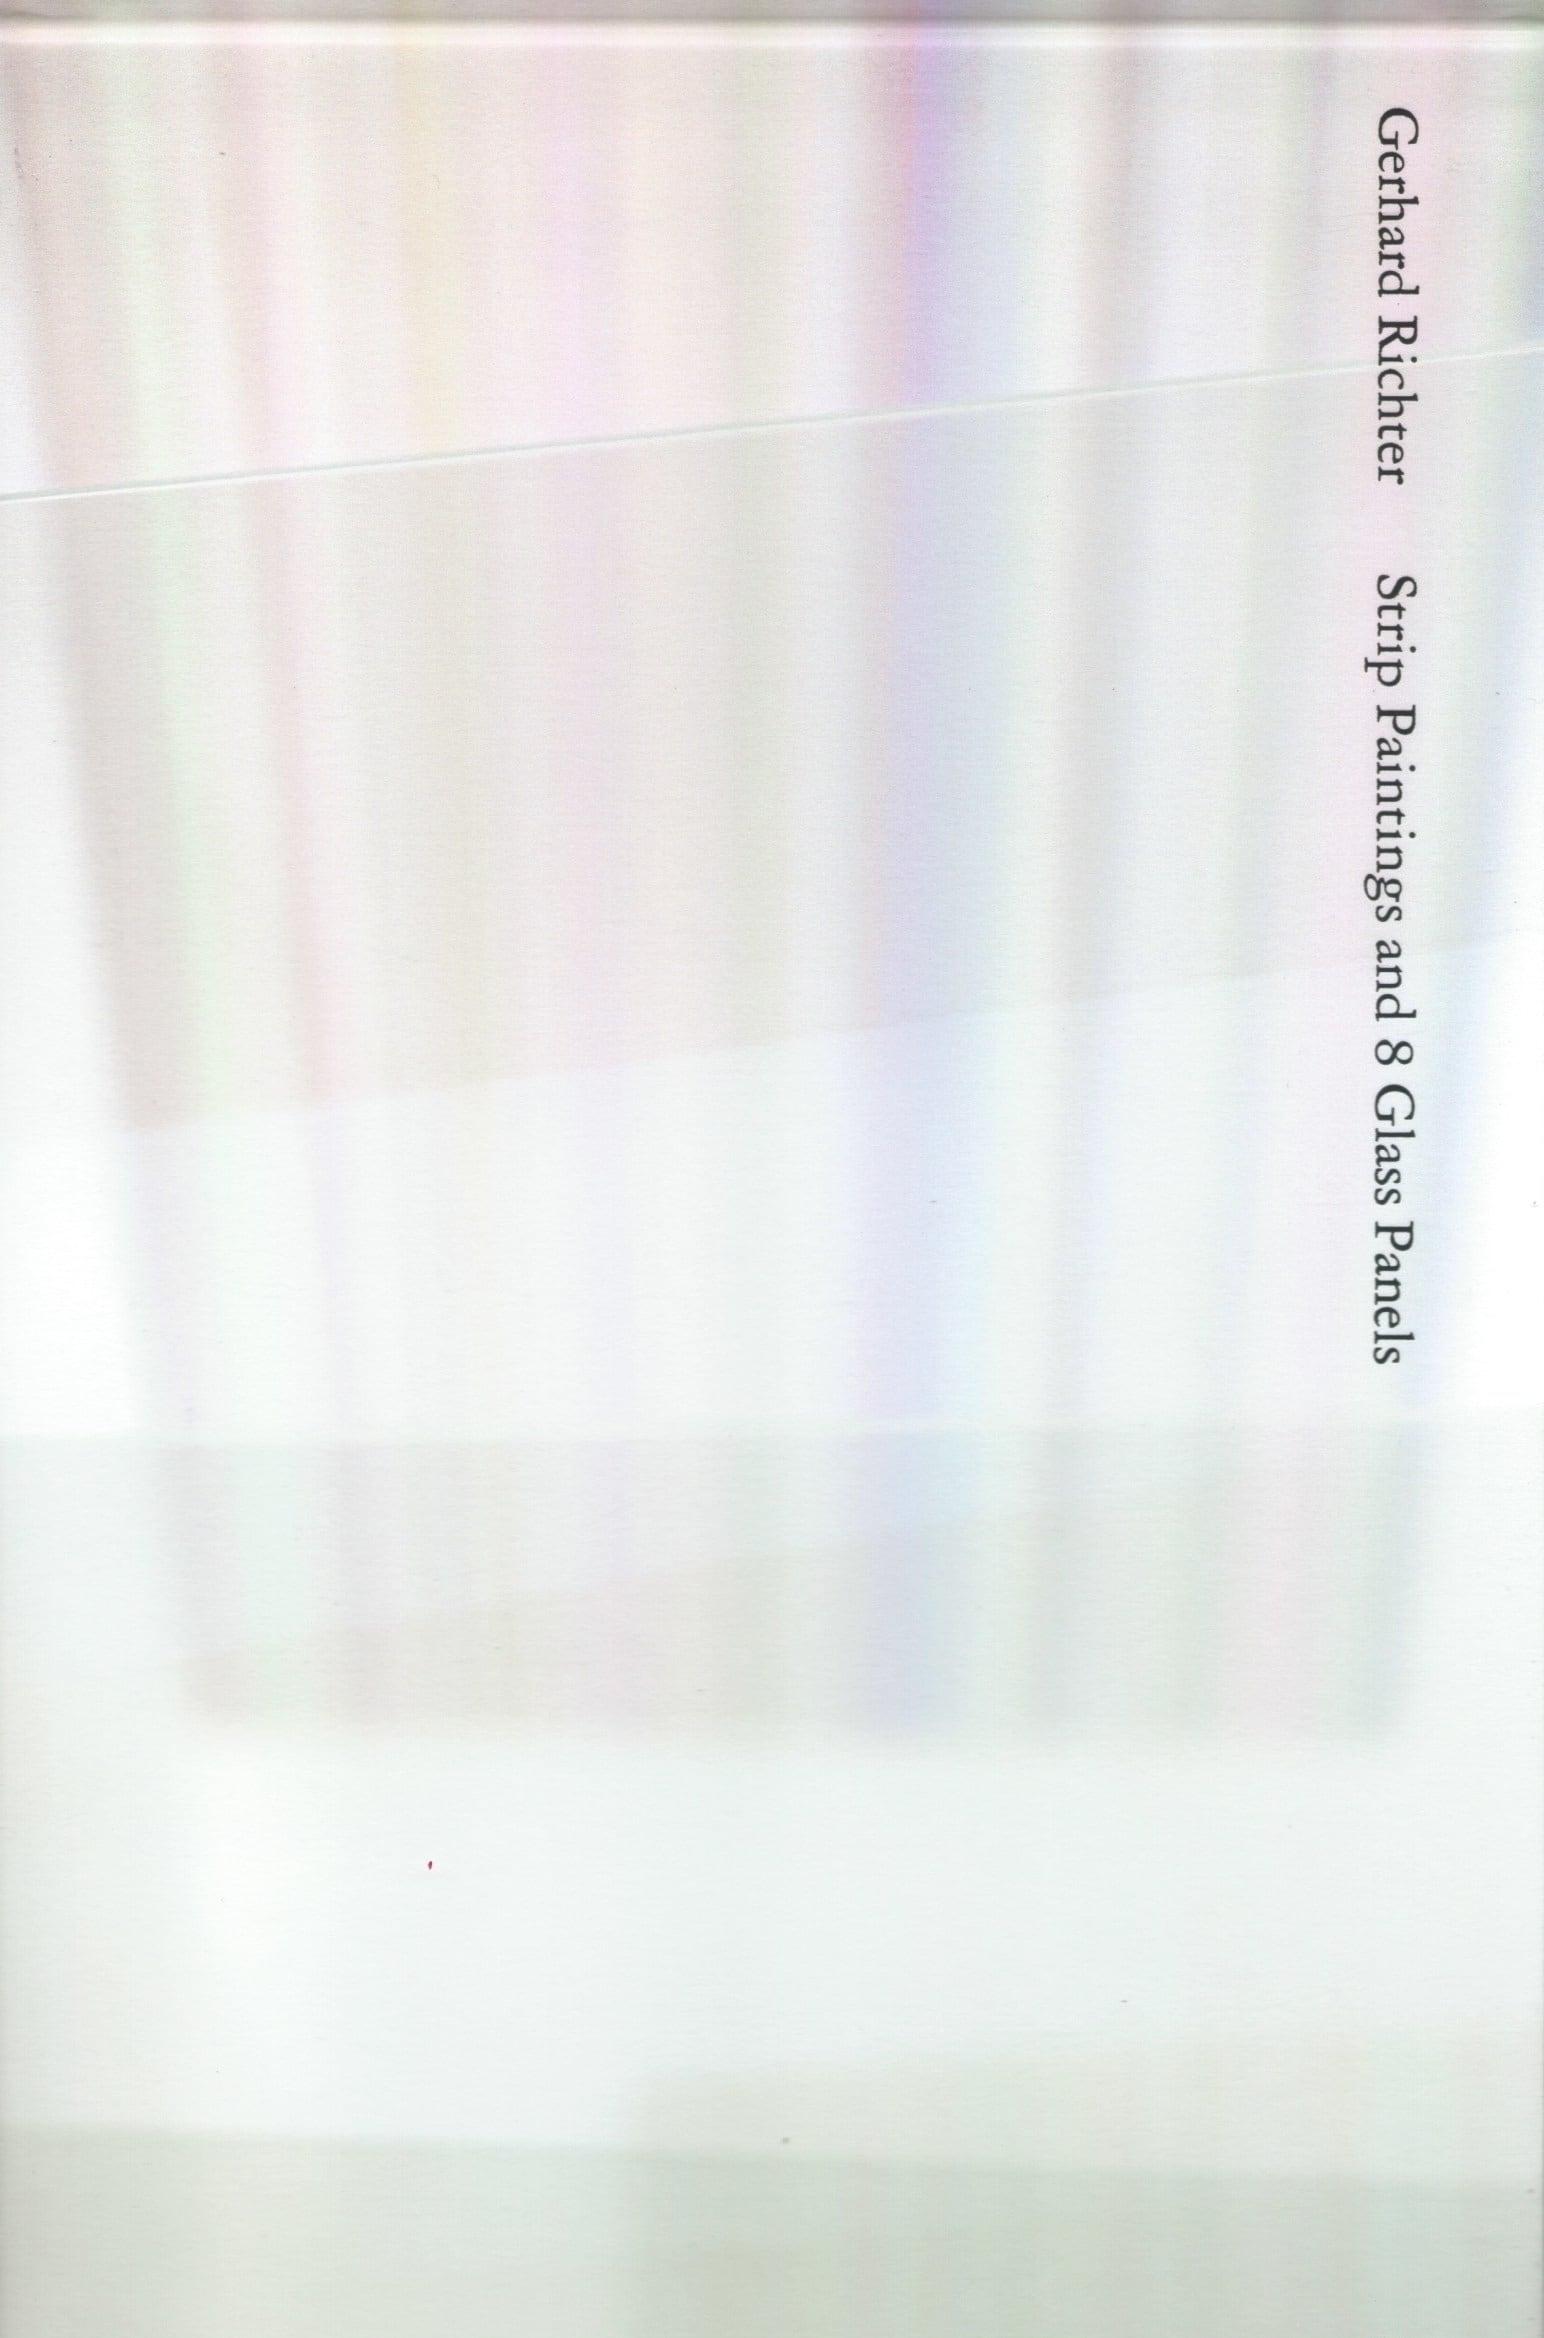 Strip Paintings and 8 Glass Panels / ゲルハルト・リヒター作品集